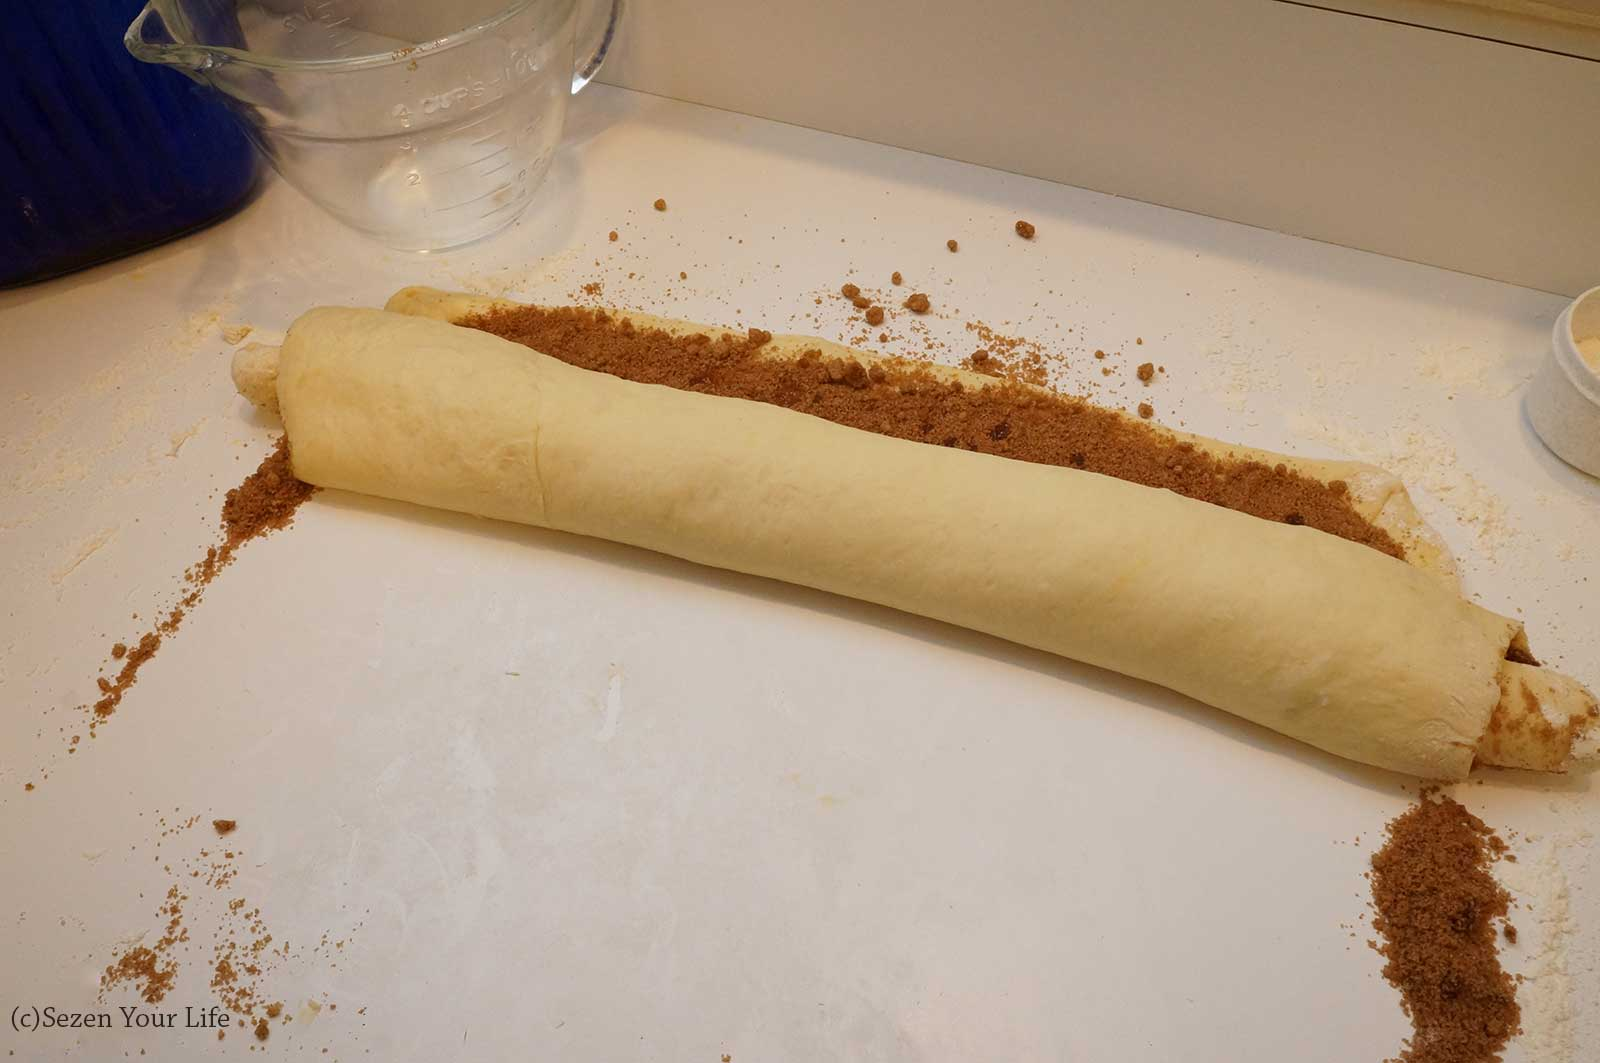 Rolling Cinnamon Rolls by Sarah Franzen